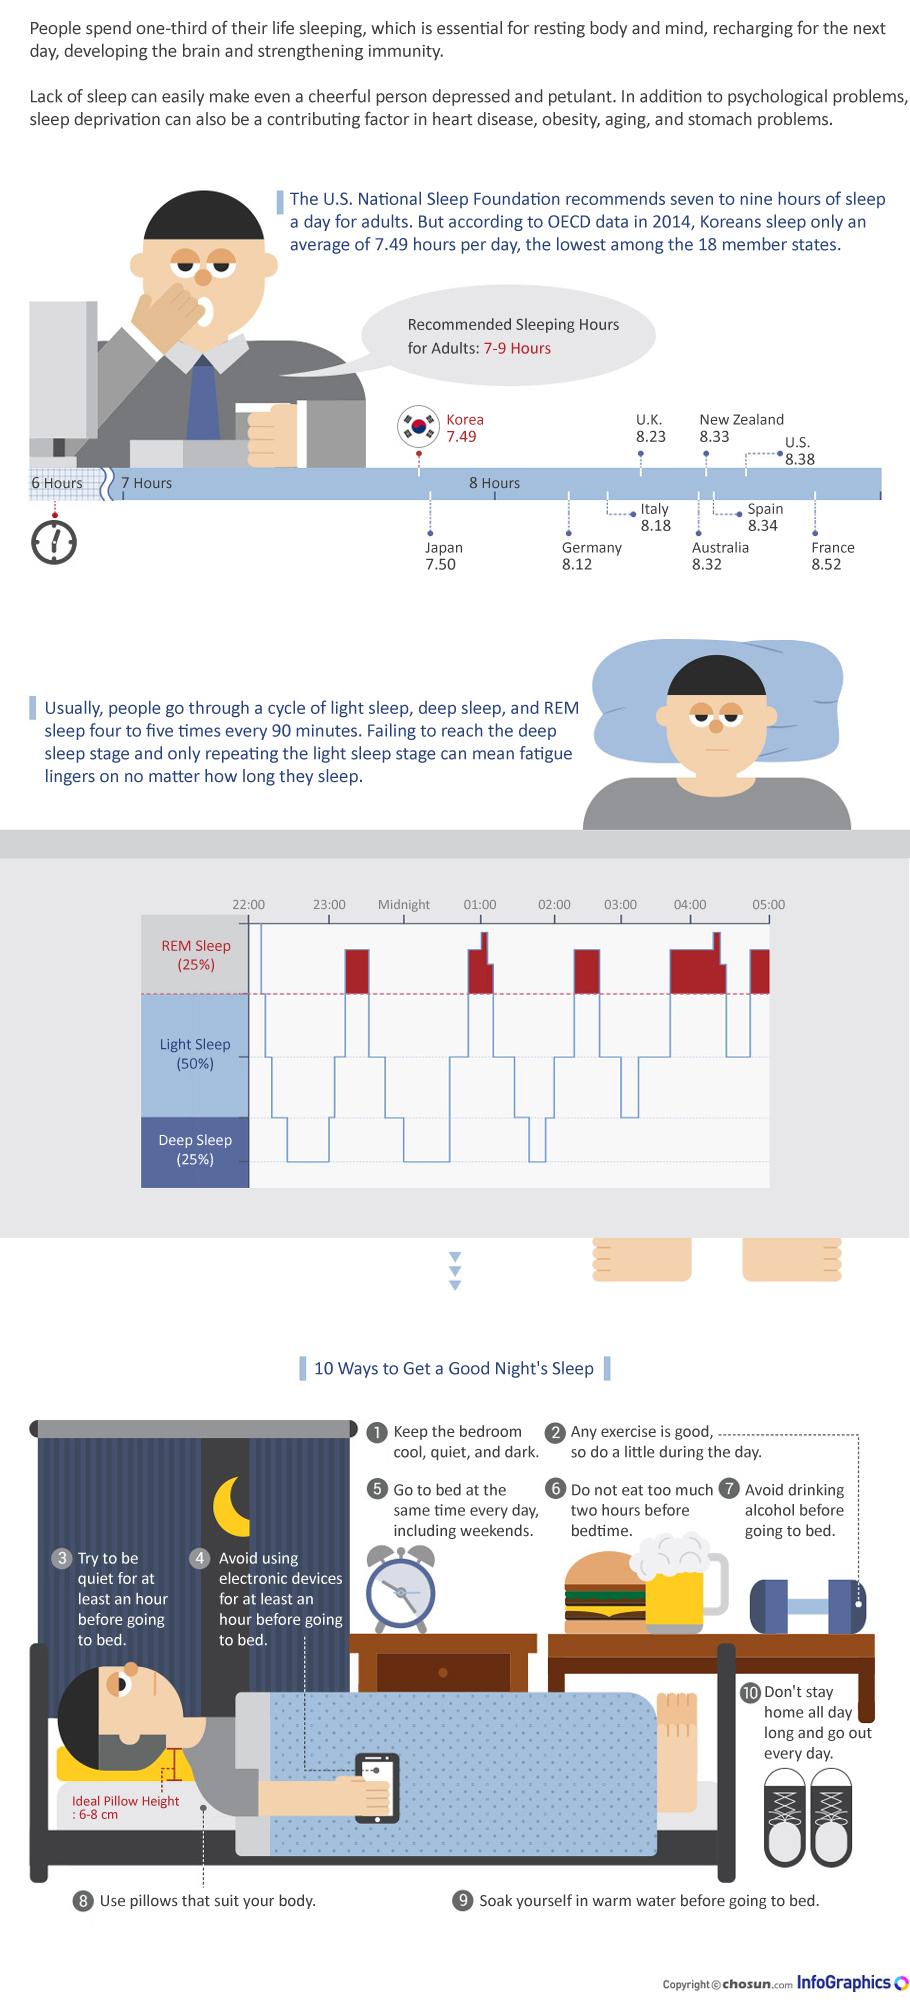 how to get a good night s sleep the chosun ilbo english edition how to get a good night s sleep the chosun ilbo english edition daily news from korea infographics